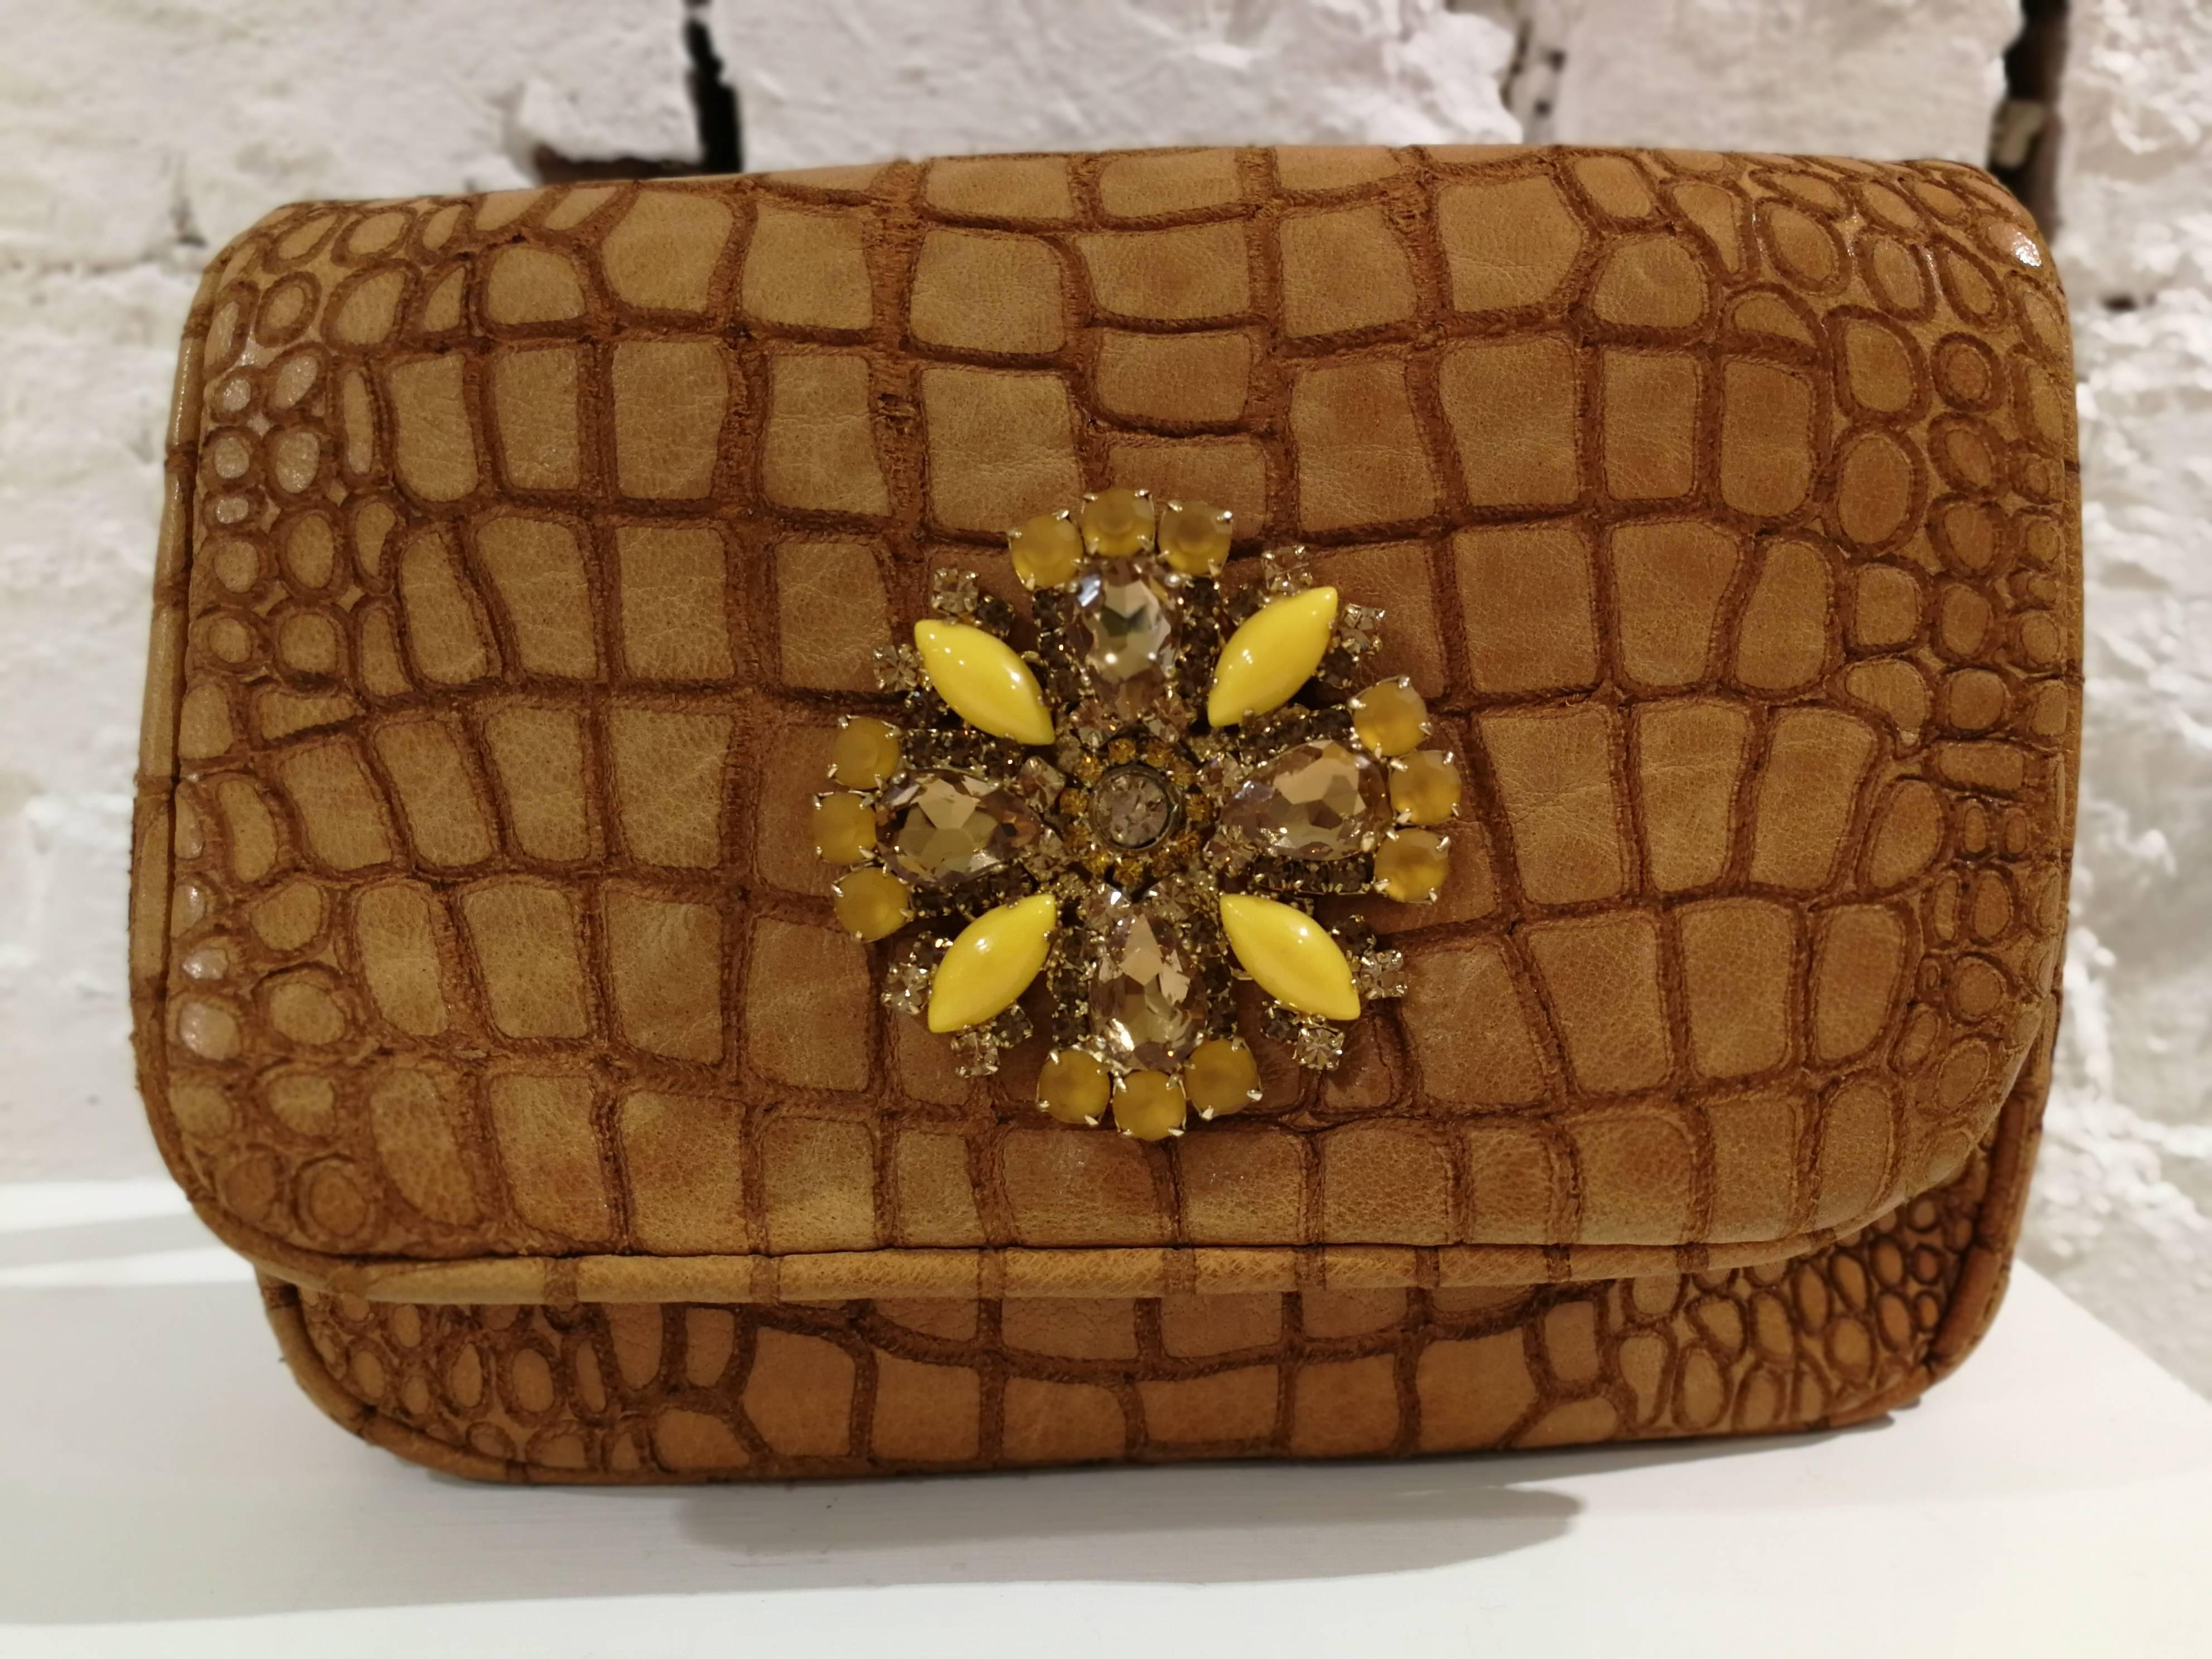 1stdibs Aphros Brown Leather Croco Stamp Handle - Shoulder Bag WrUiAM2